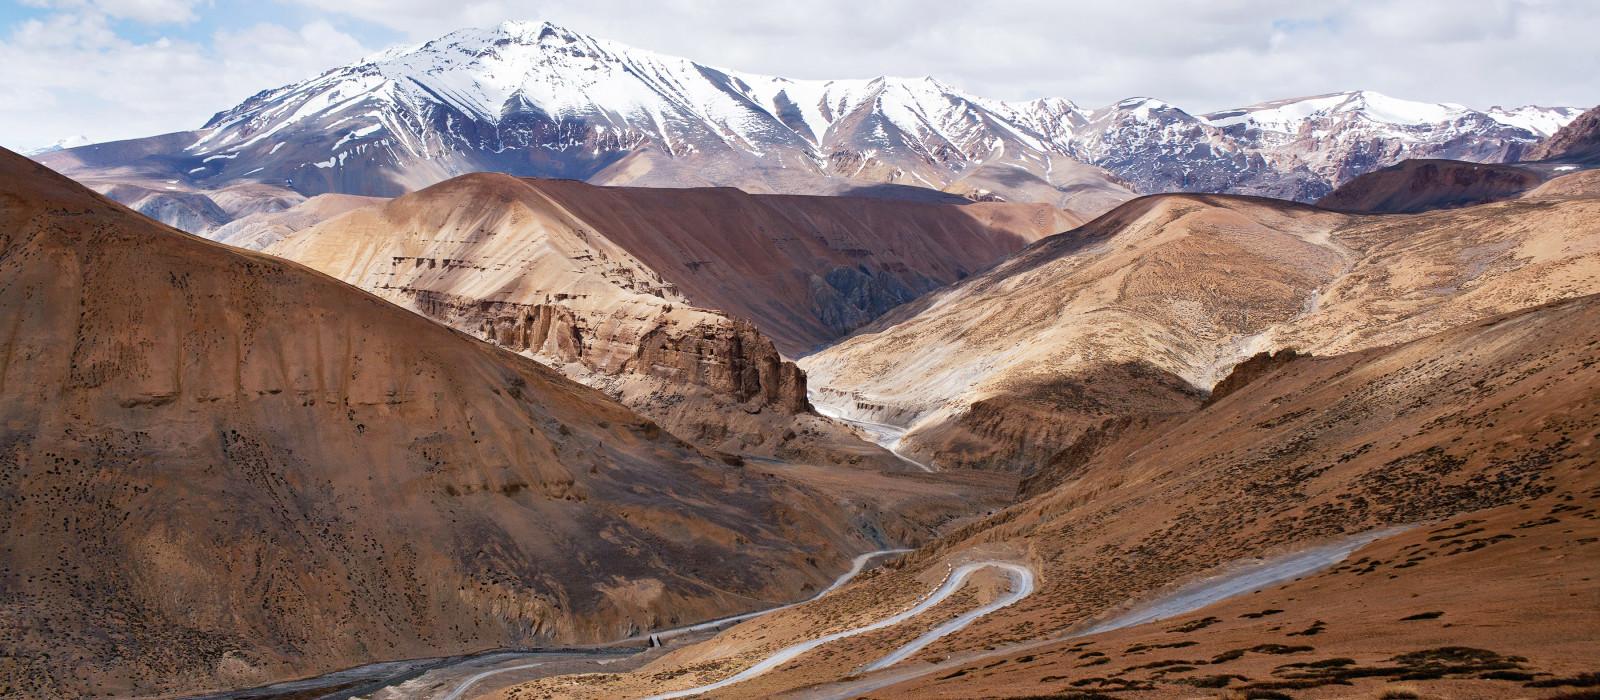 Himalaya mountain landscape, Manali - View of Leh highway in Ladakh, Jammu and Kashmir, India